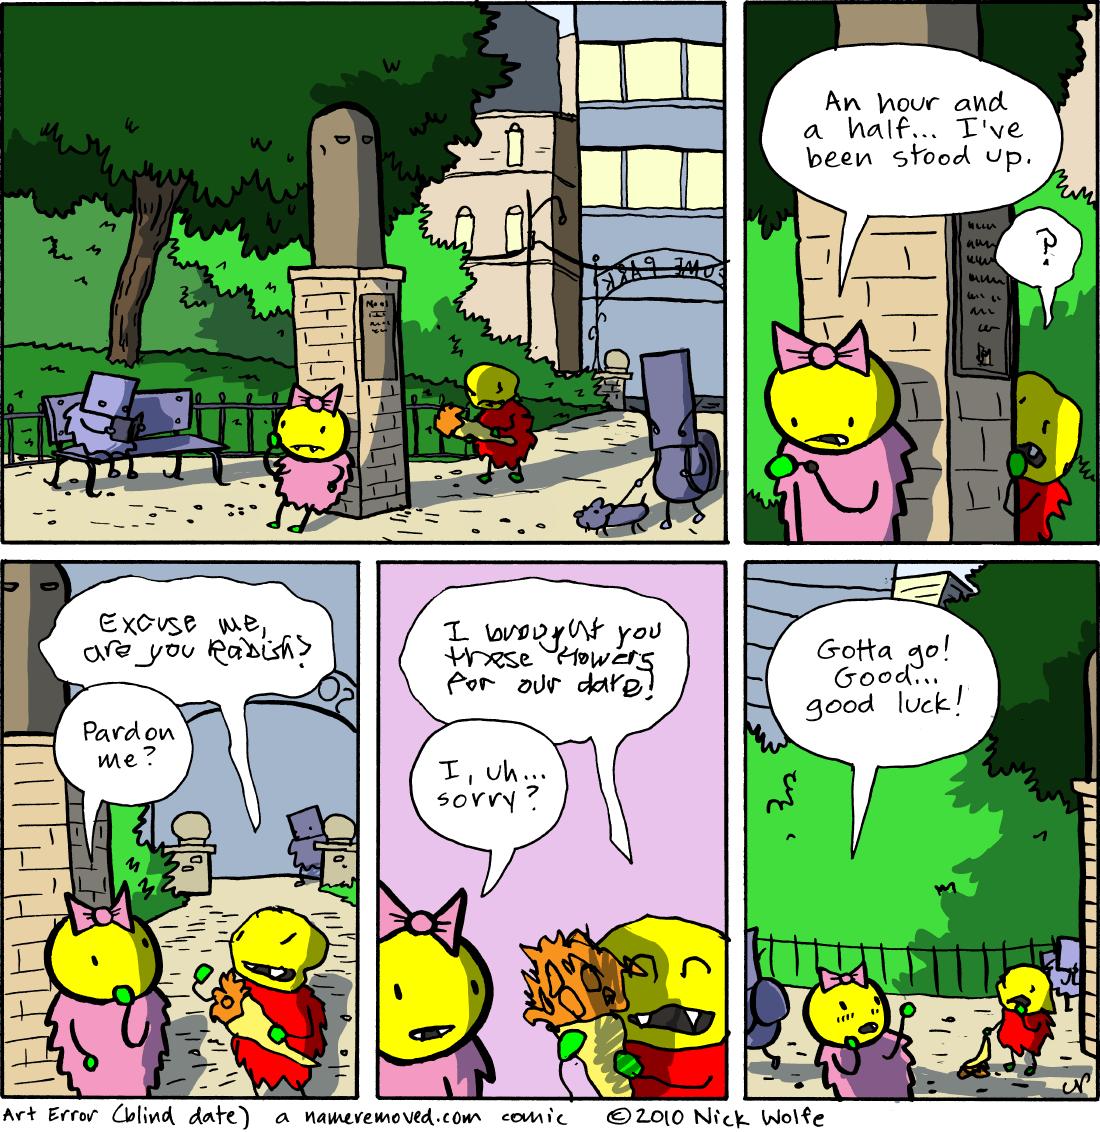 Art Error (blind date)